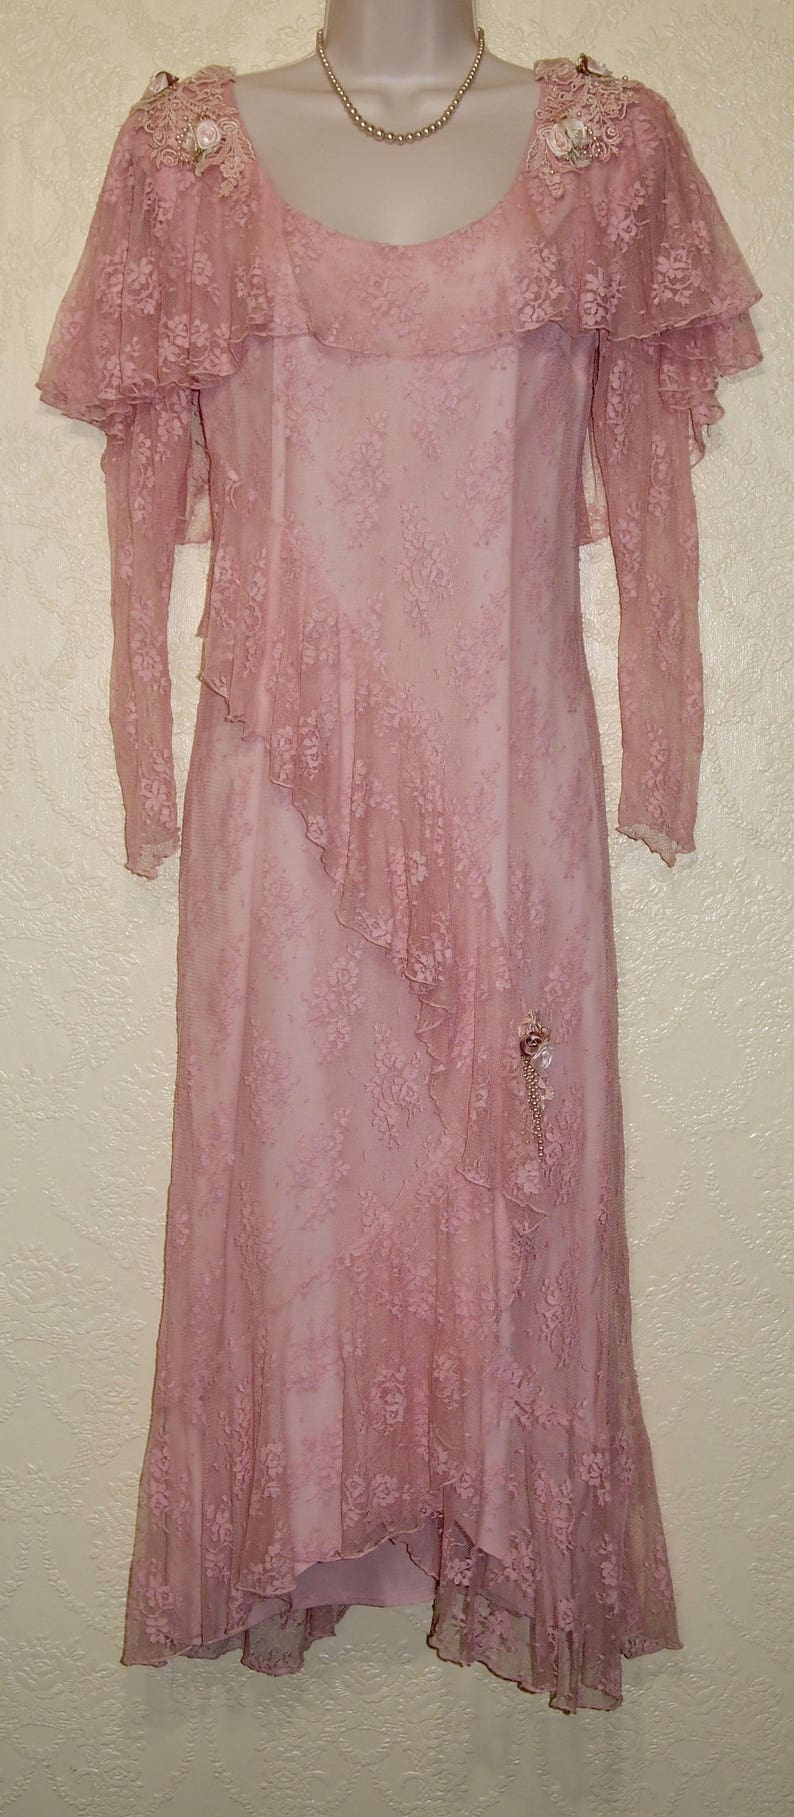 Romantic BLUSH Pink Lace Dress size 8-10 Susan Lanes Country Elegance dress